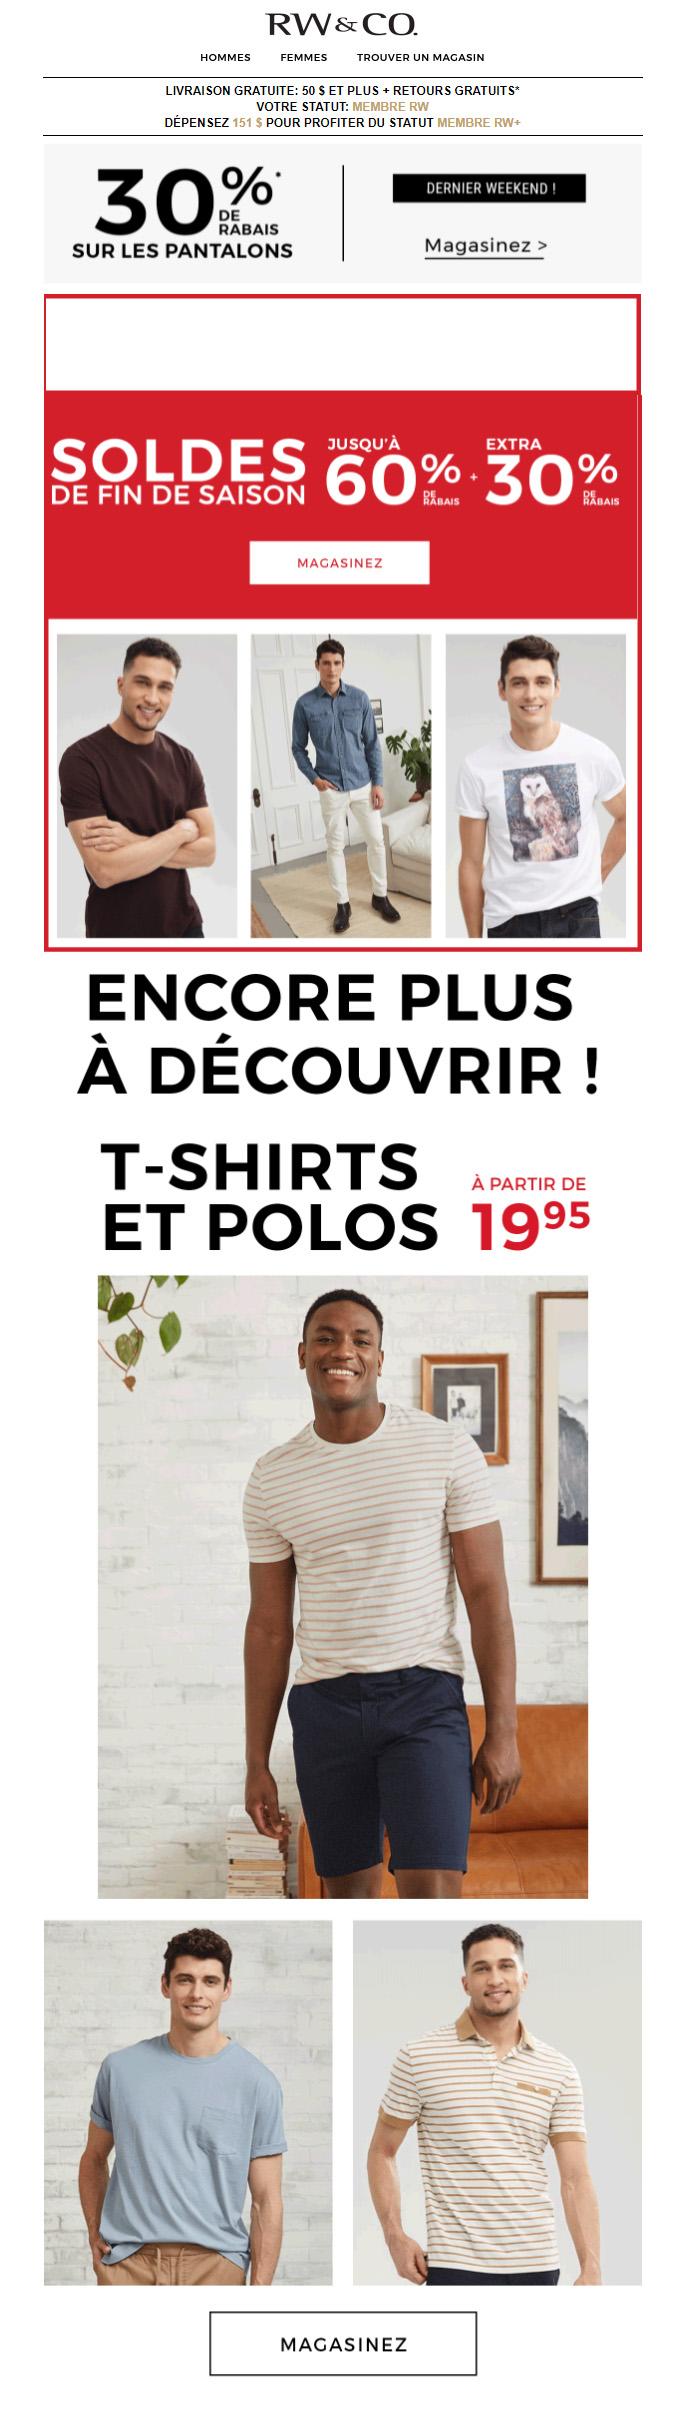 Il Vente Des Rabais ! 60% + 30% Aditionnel